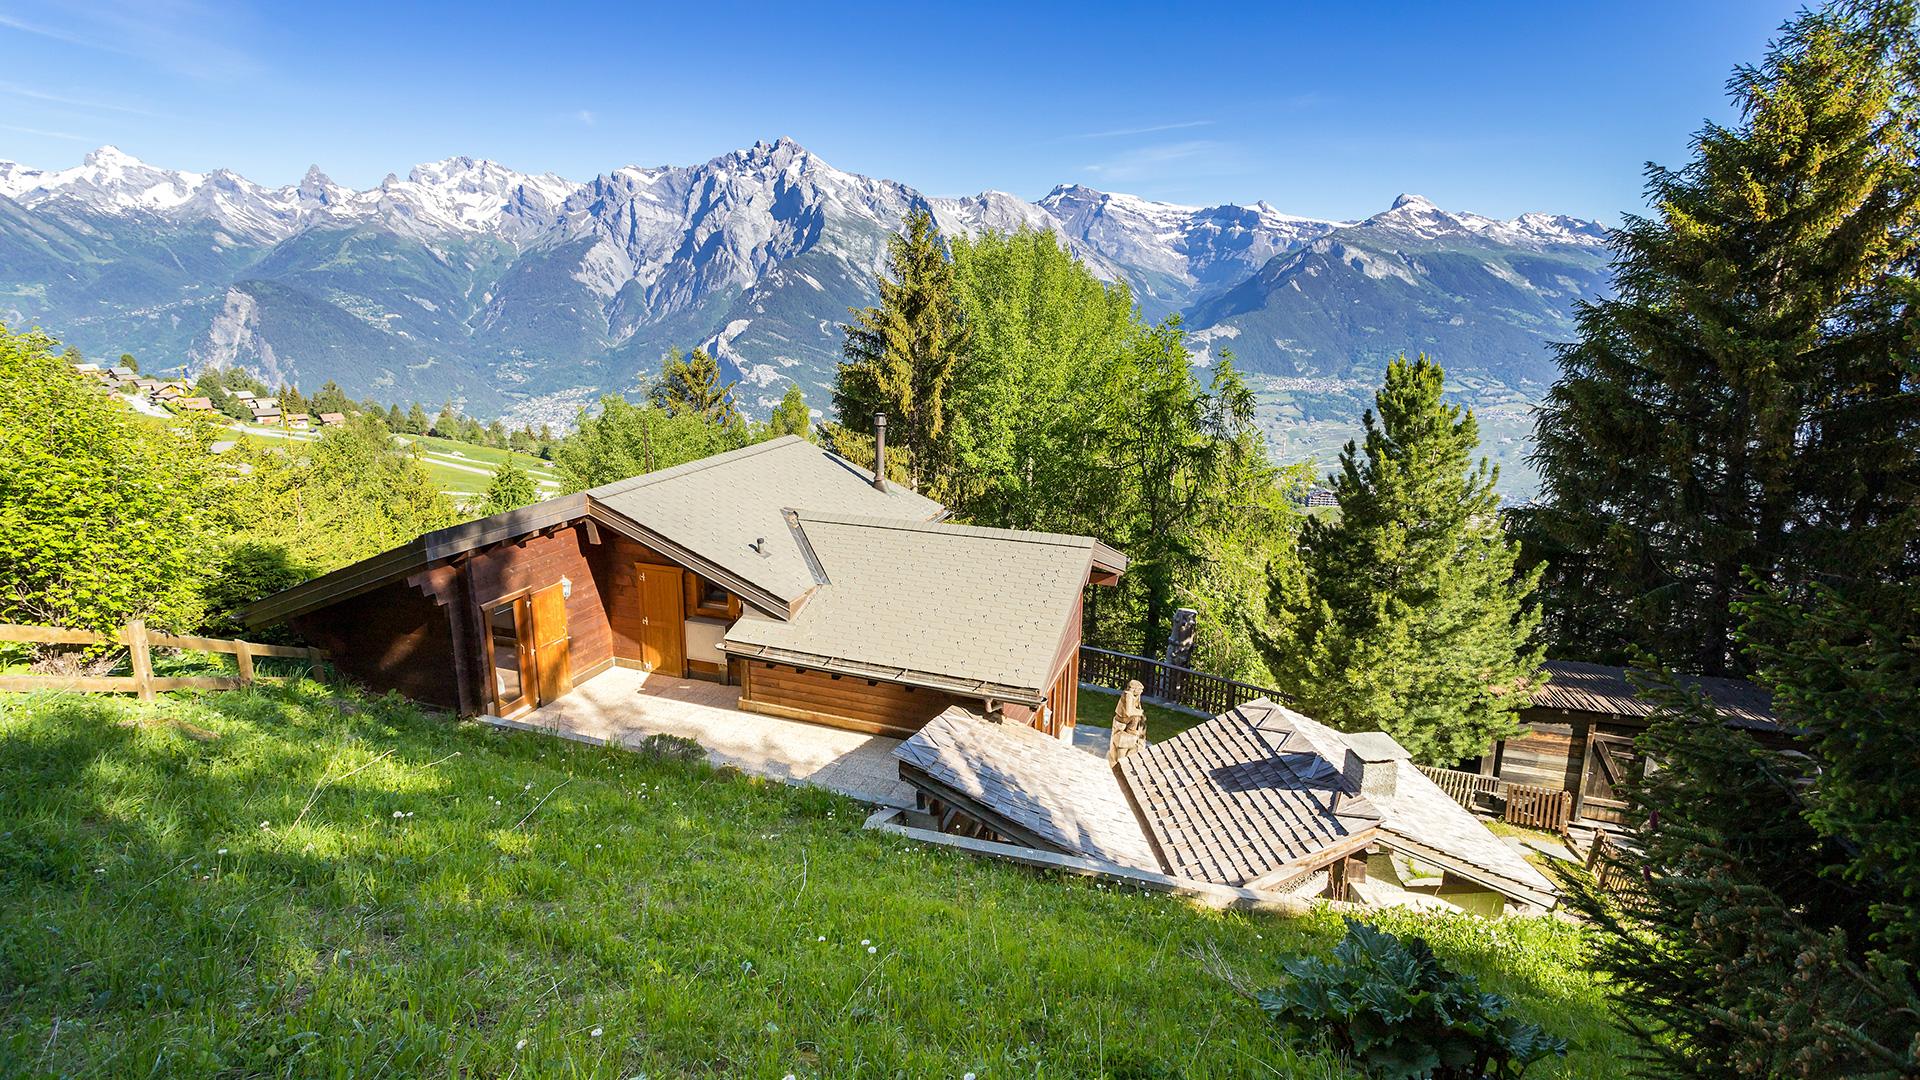 Chalet Sofleu Chalet, Switzerland